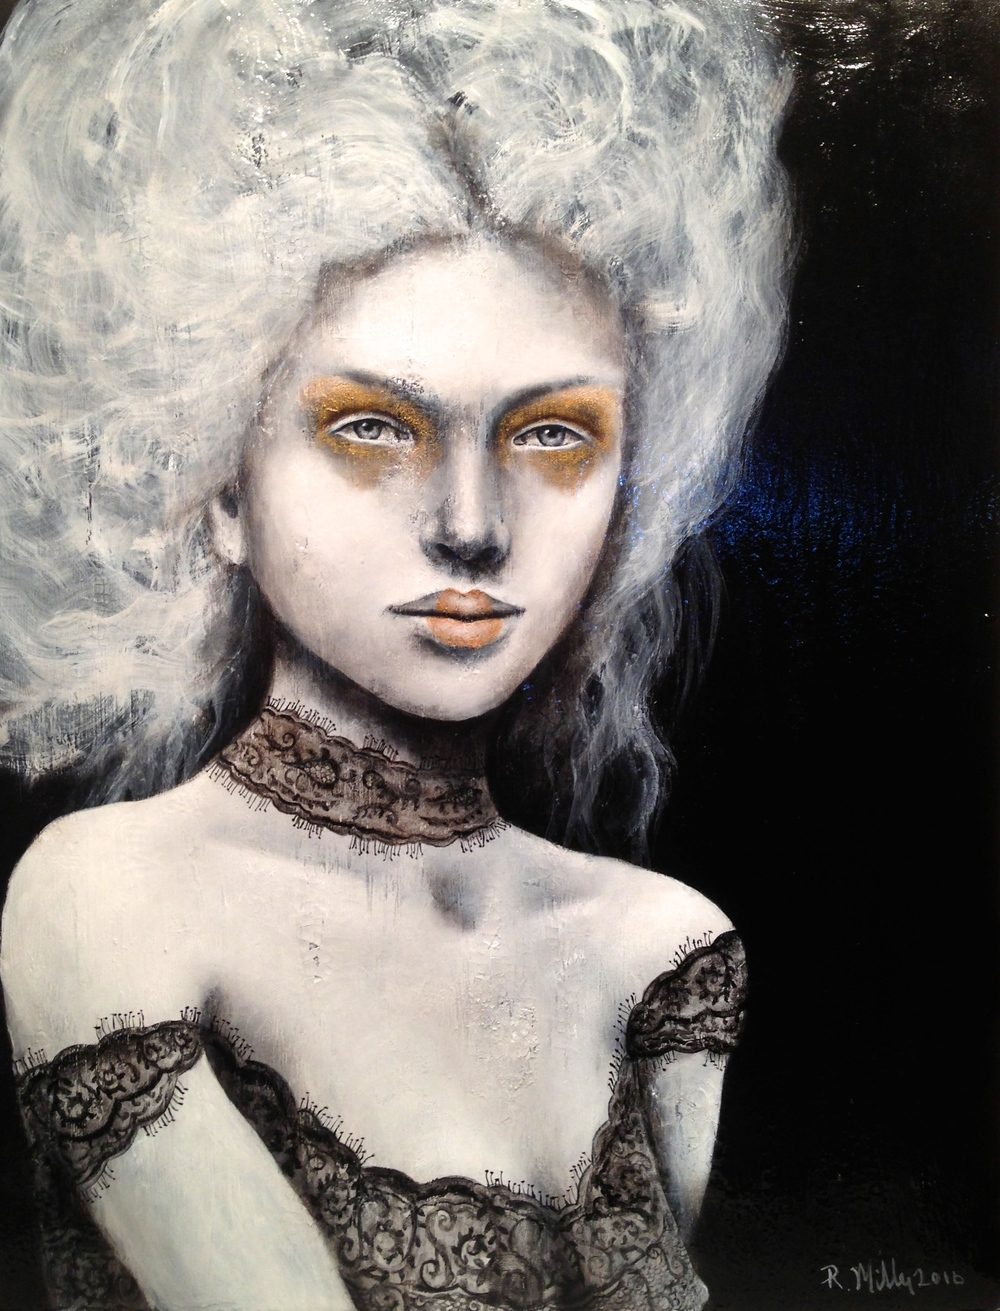 "(Varnished)La Tentatrice,2016   Acrylic, oil, texture medium on canvas 22"" x 28"""